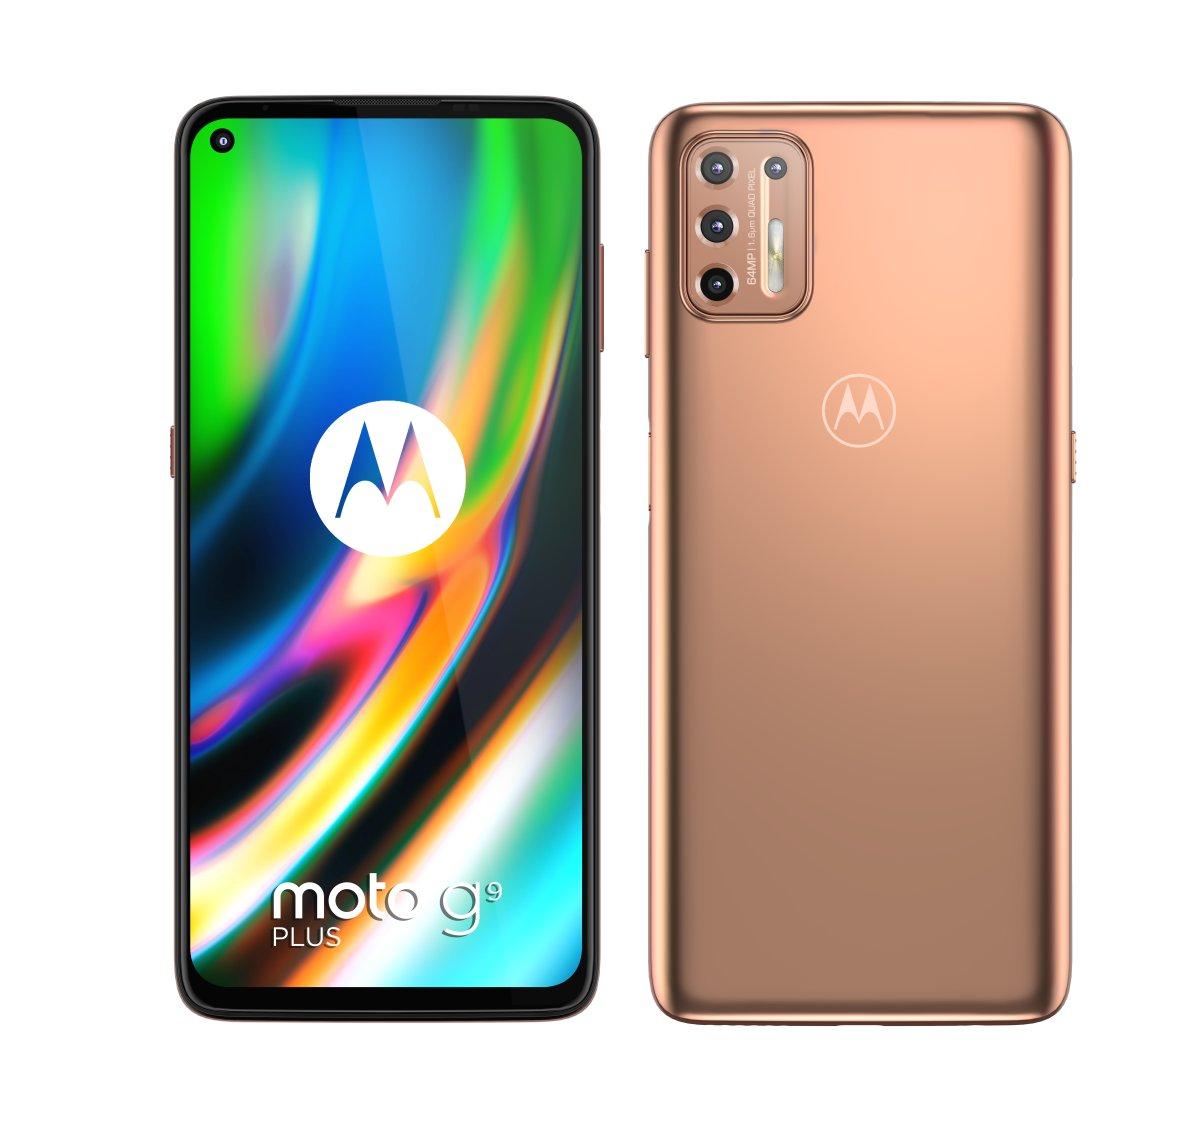 Motorola Moto G9 Plus cena